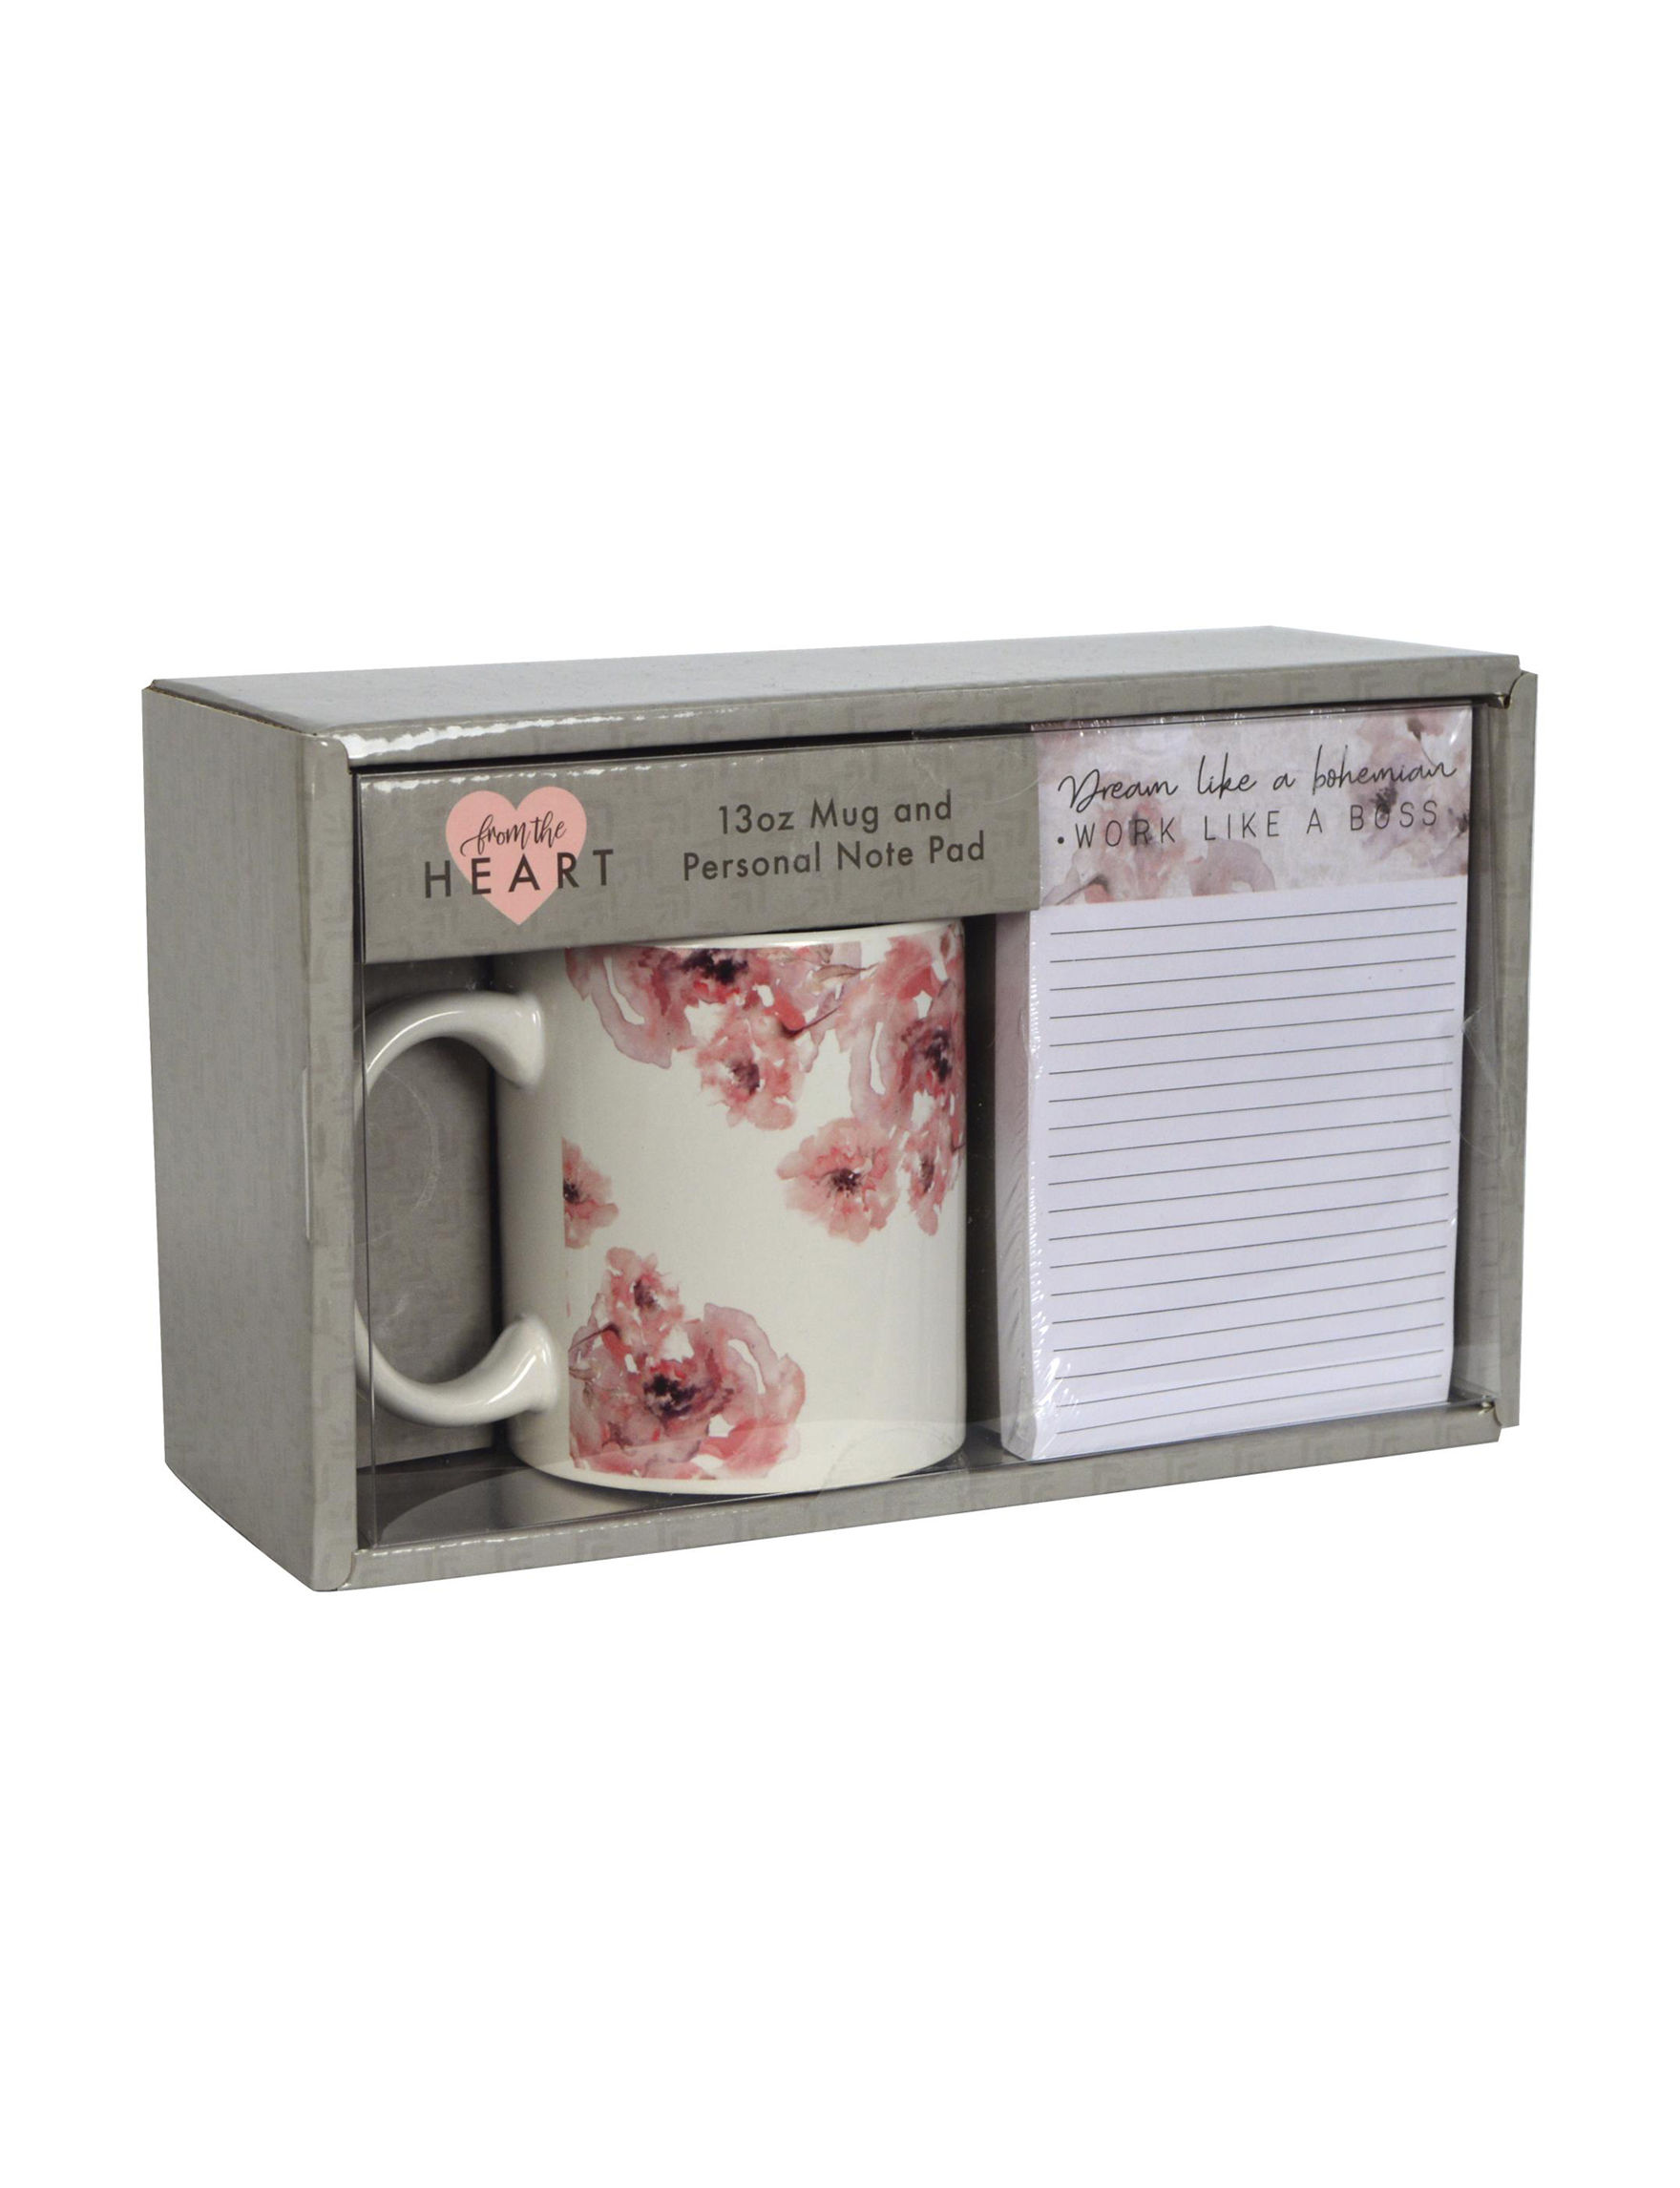 New View Grey / Multi Journals & Notepads Mugs School & Office Supplies